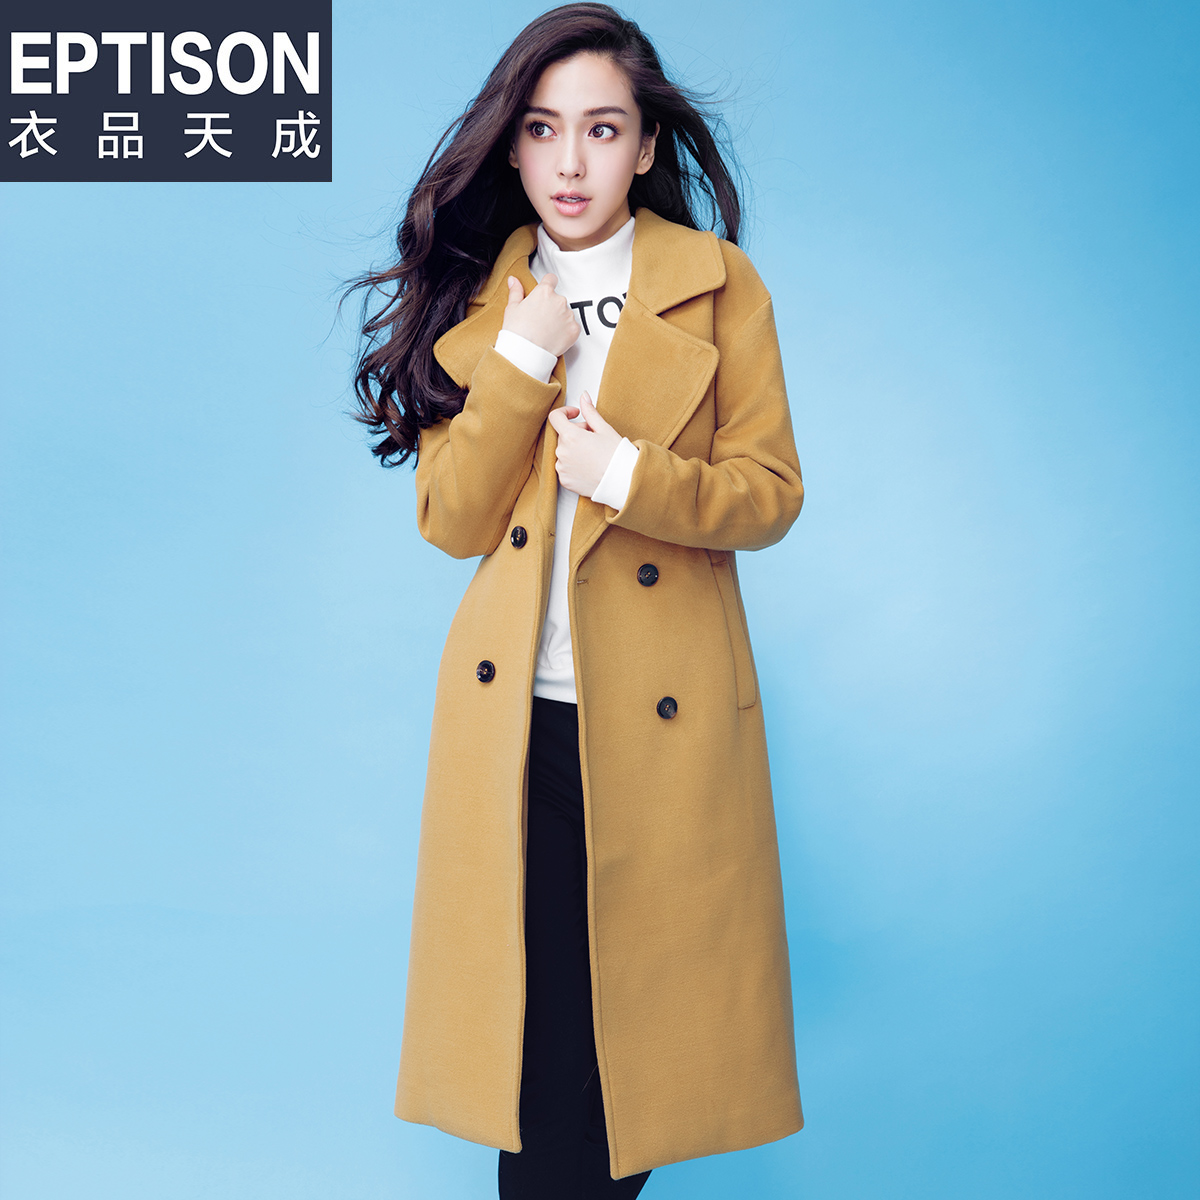 Eptison/衣品天成毛呢外套女装质量怎么样,是什么牌子